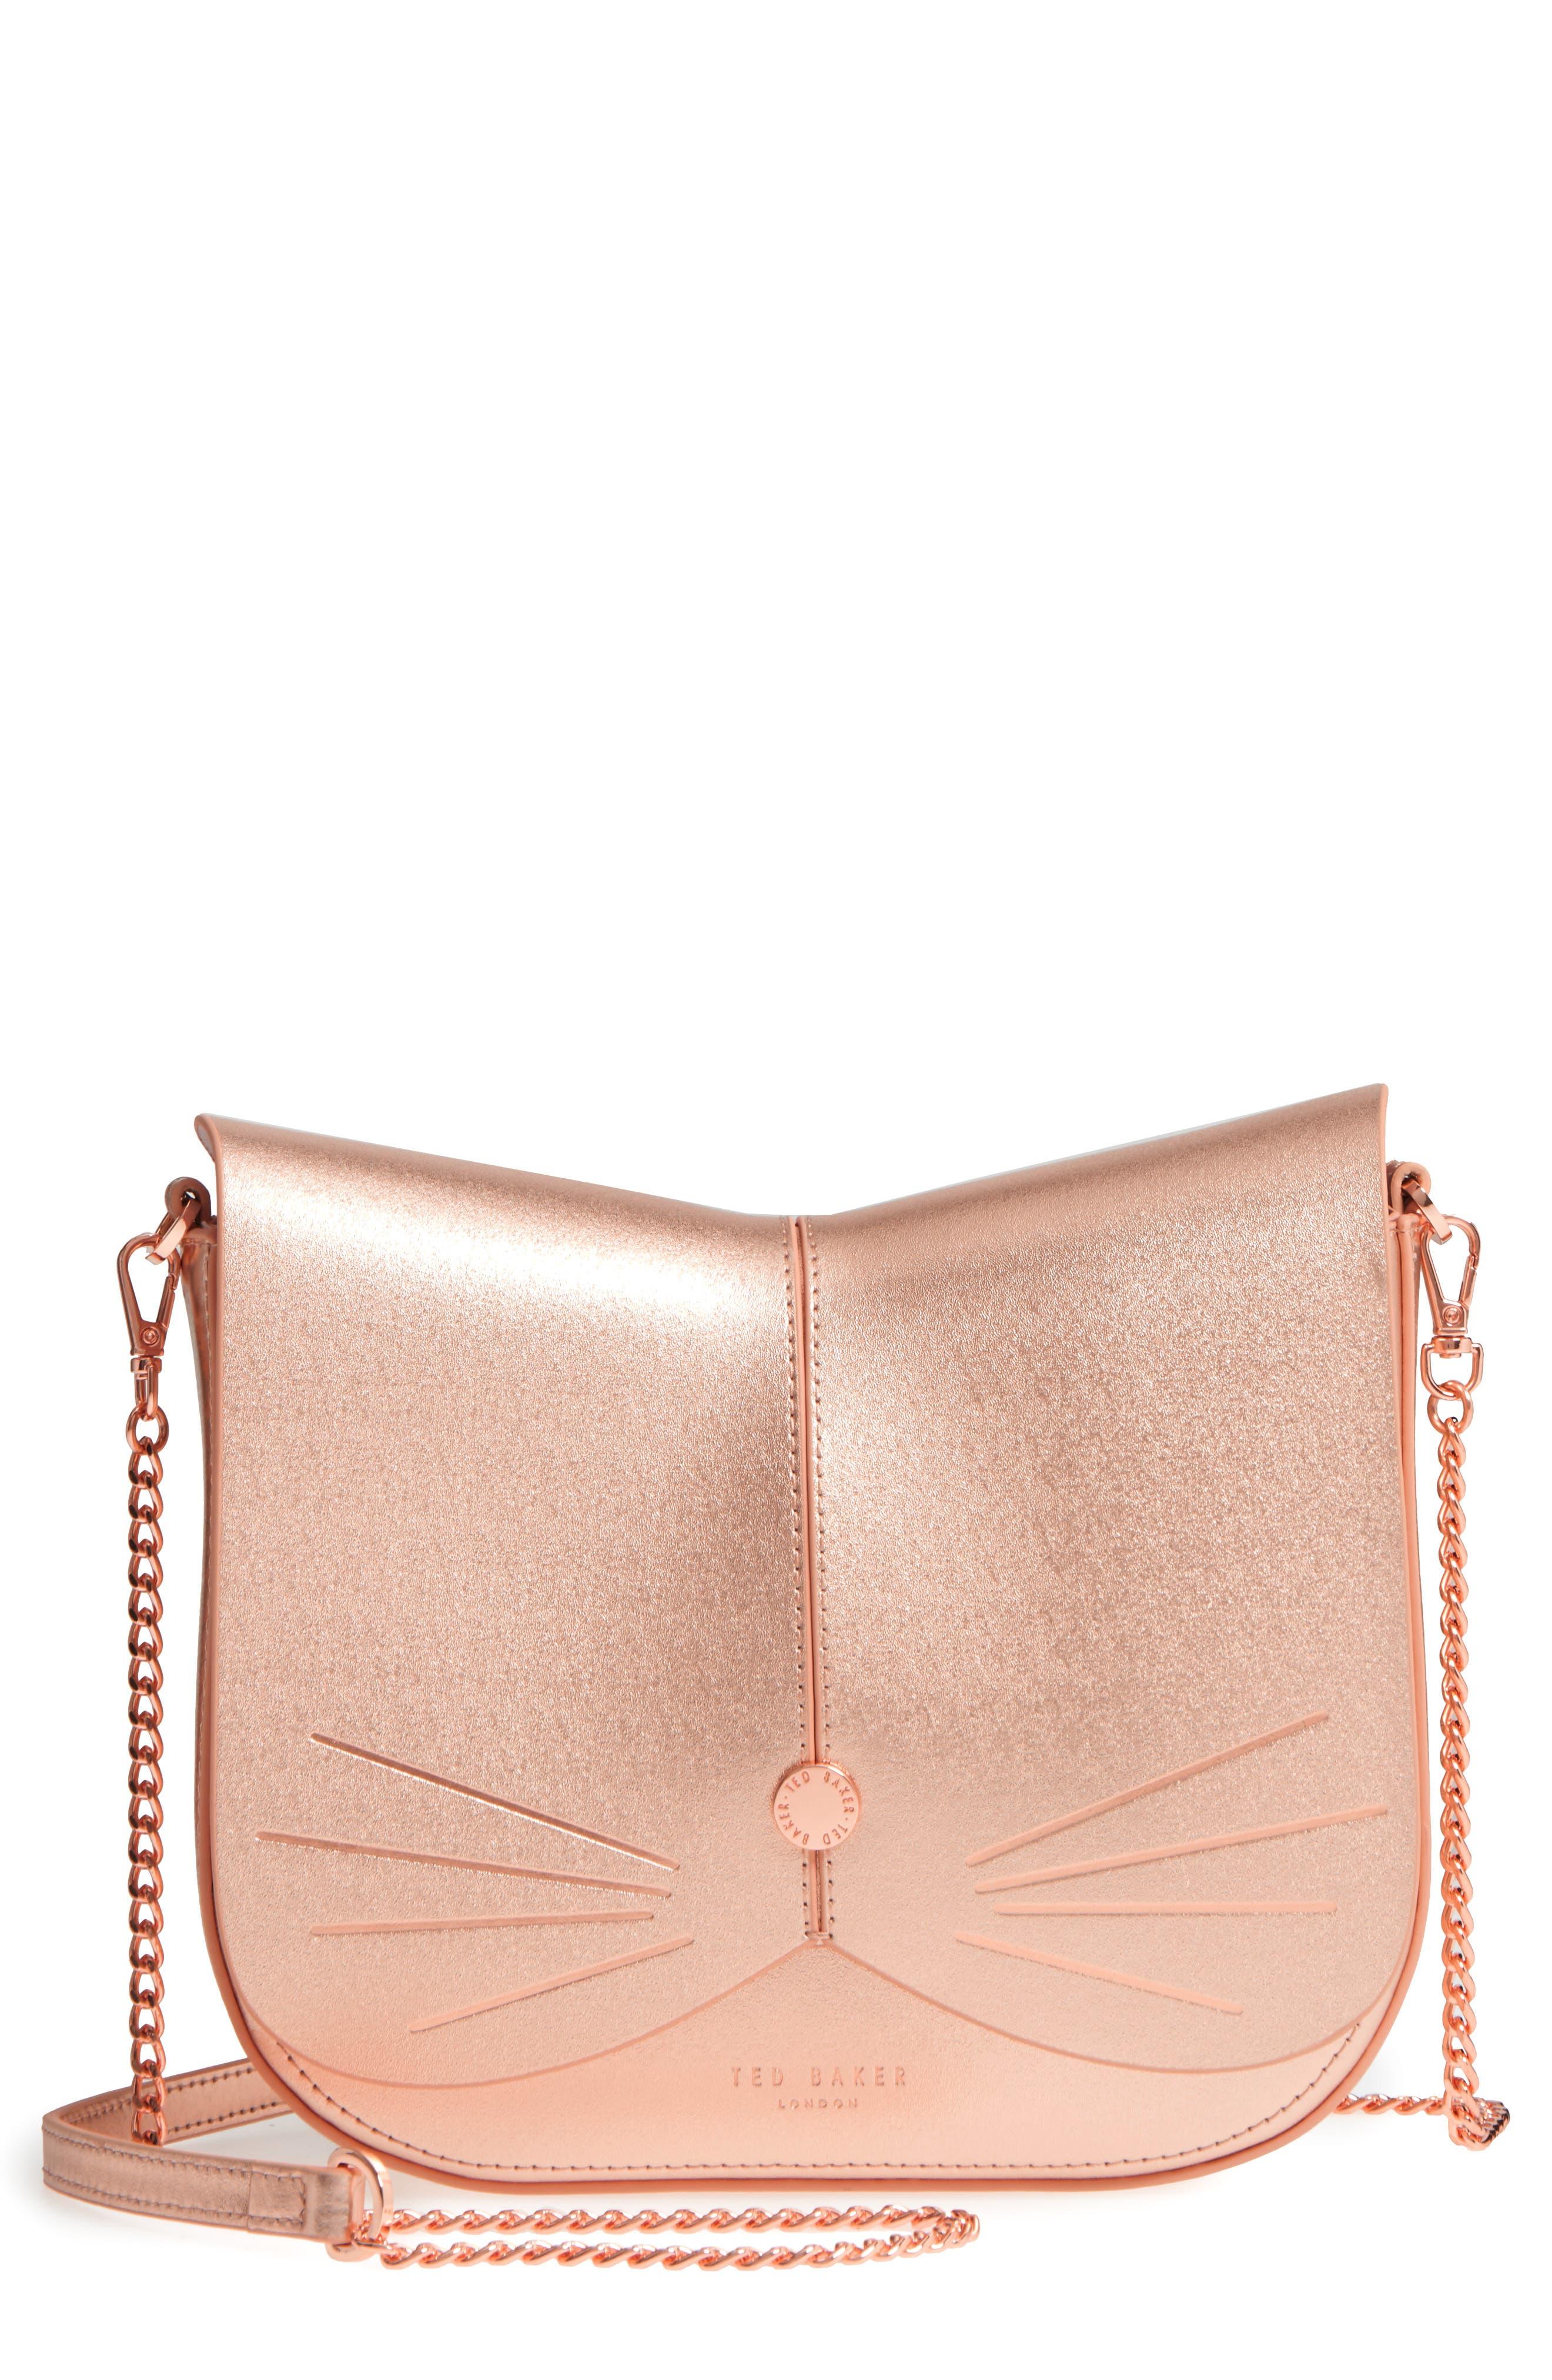 Kittii Cat Leather Crossbody Bag,                             Main thumbnail 1, color,                             Rose Gold